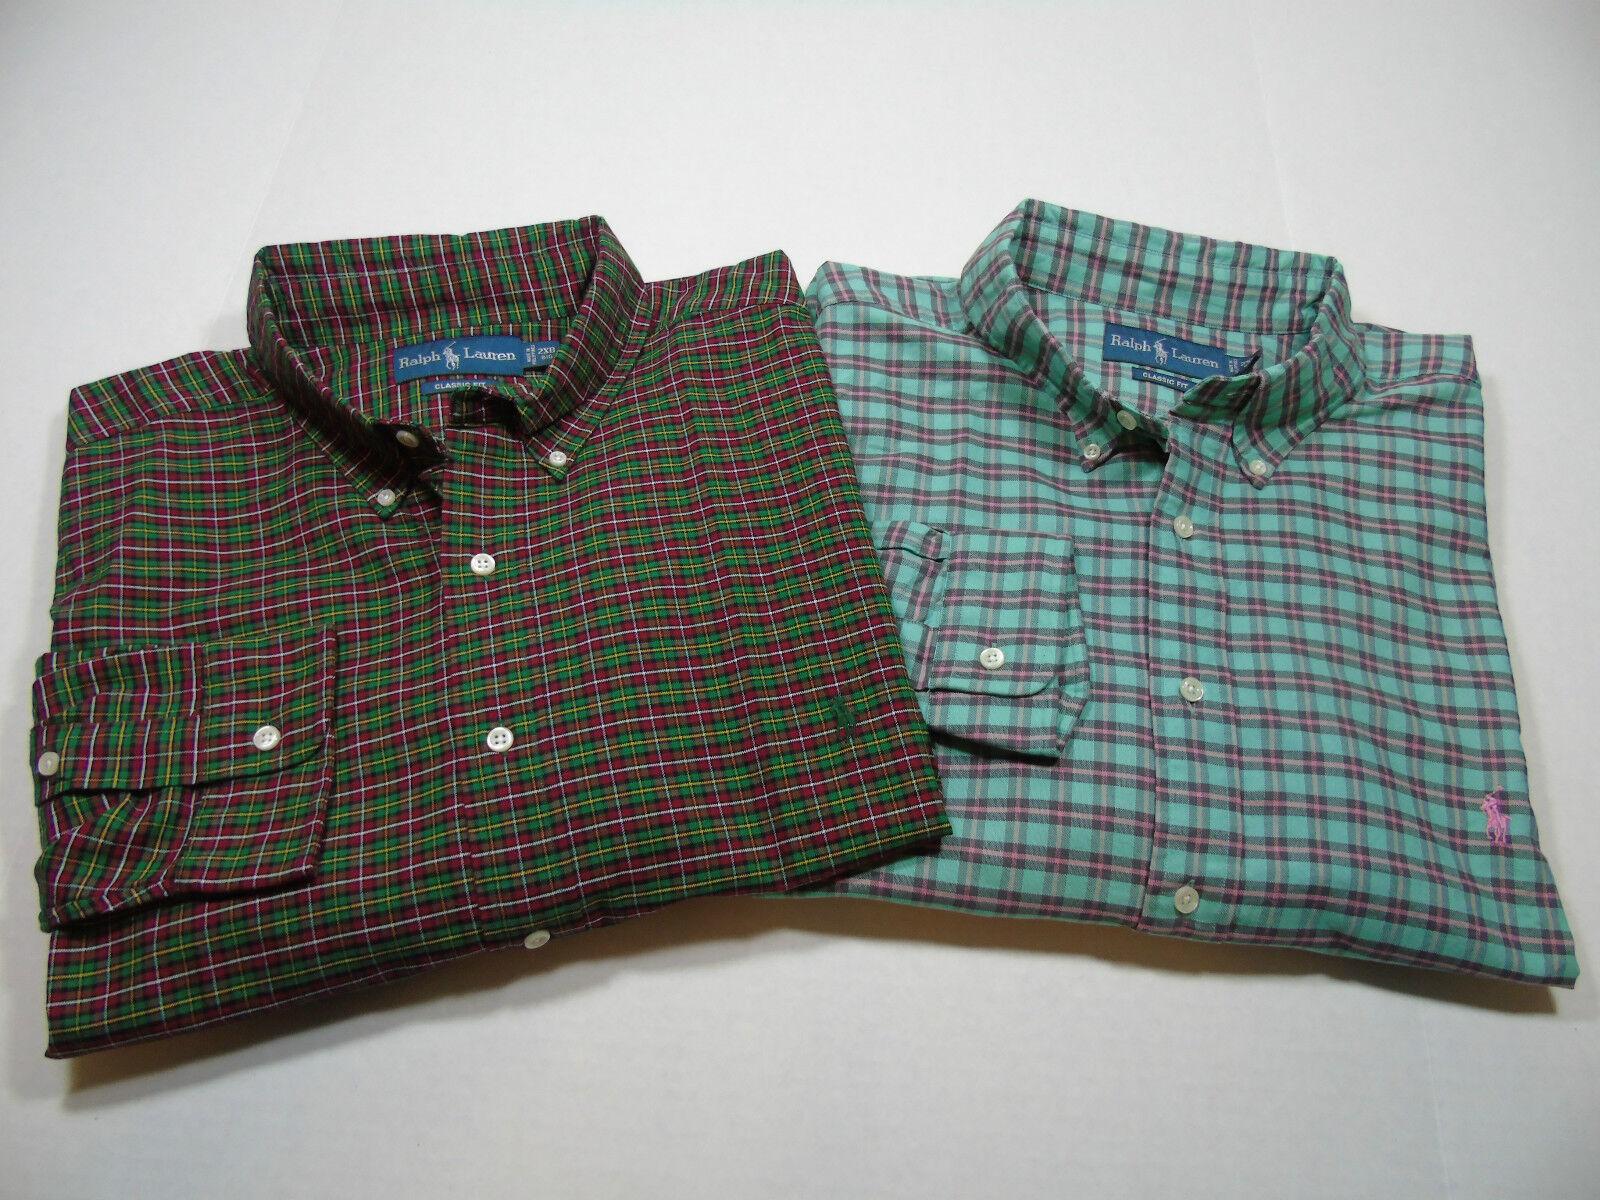 New Polo RALPH LAUREN Cotton Plaid Oxford Sport Shirt size 2XB, 3XB